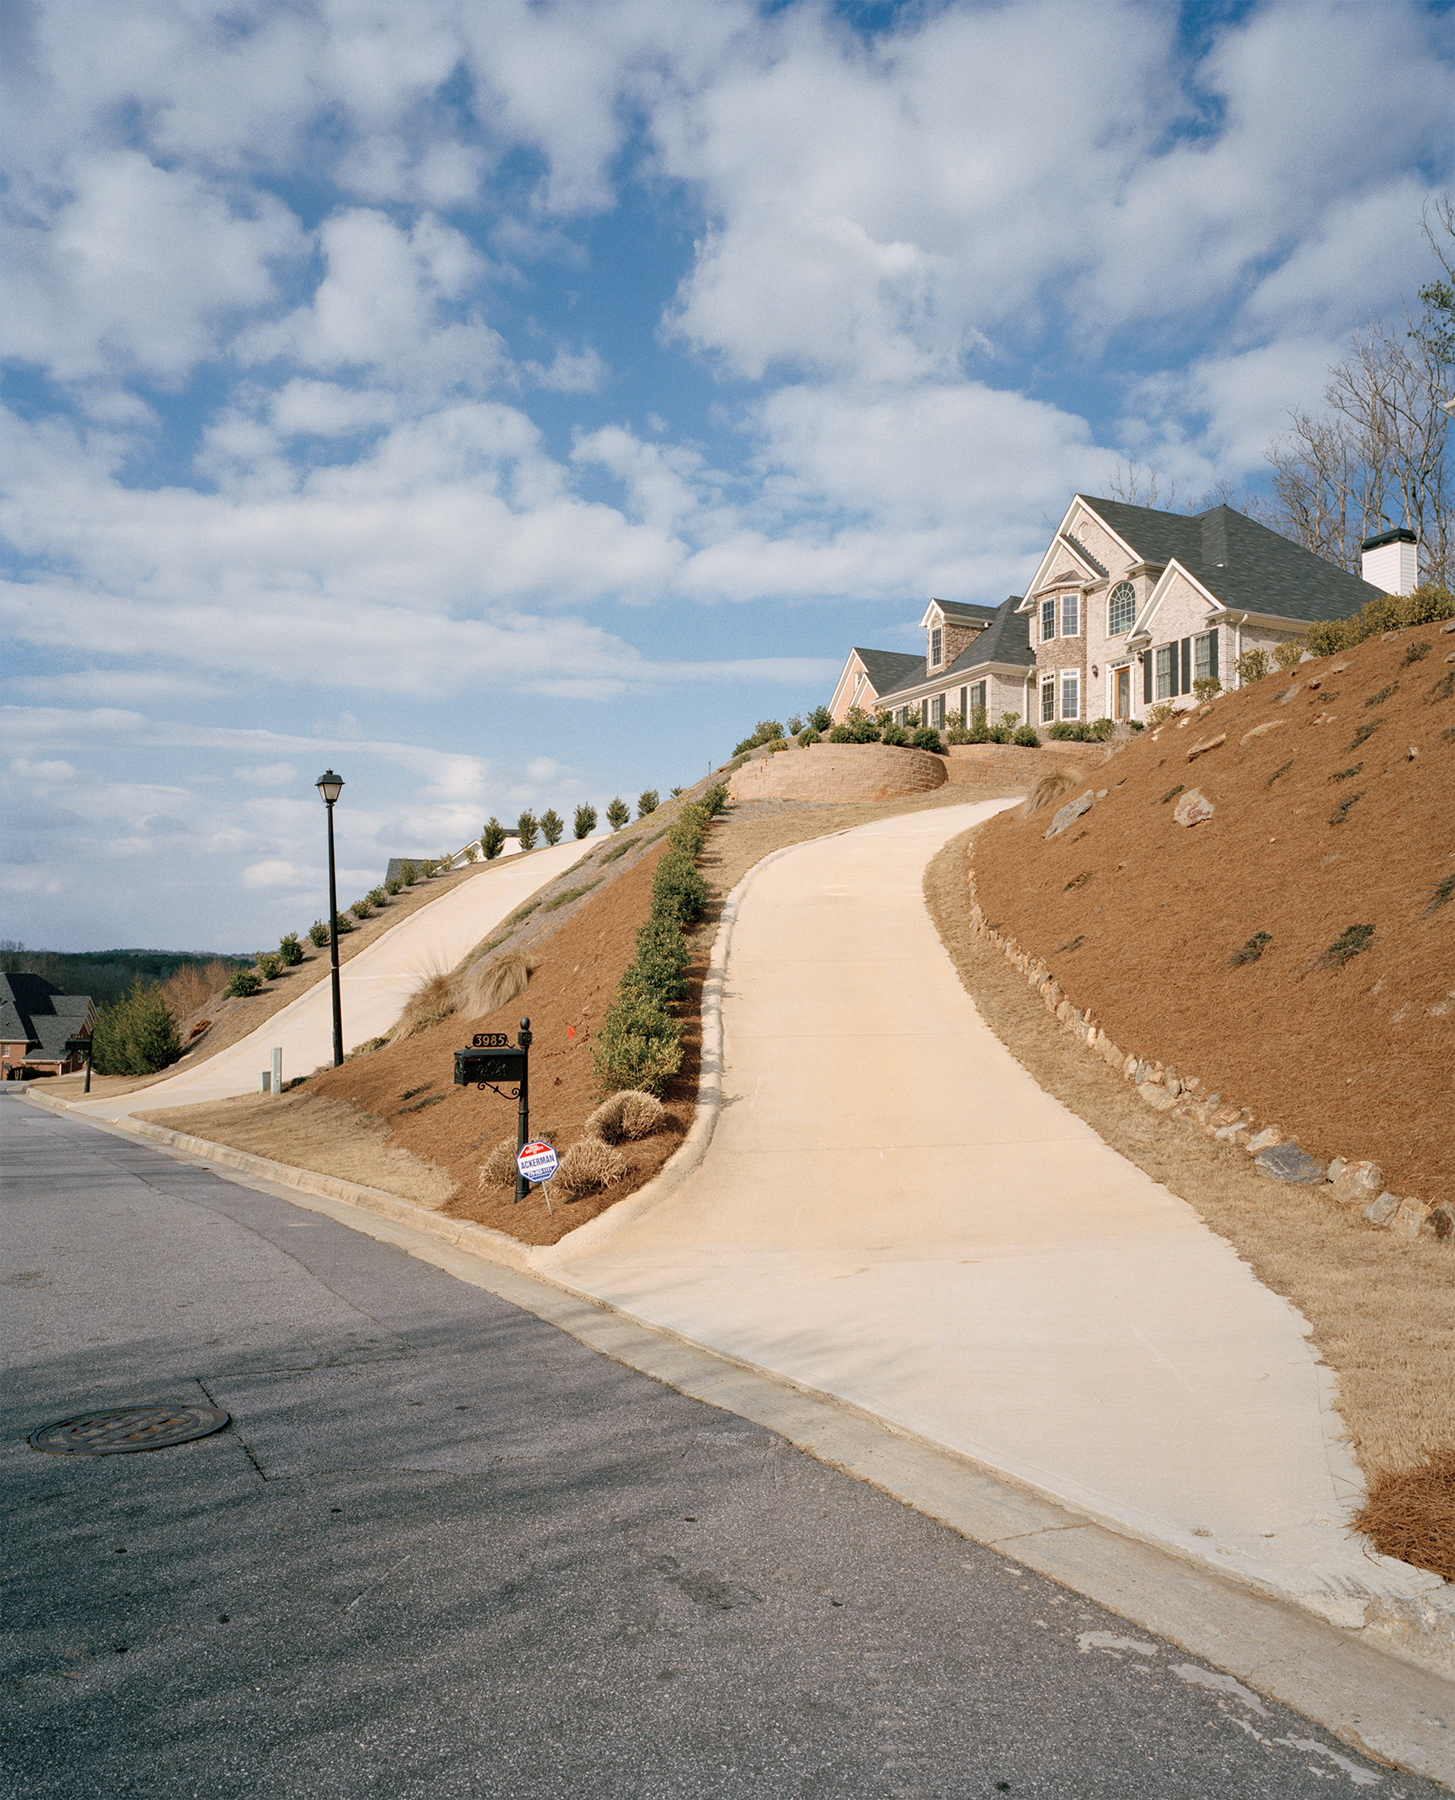 Steep Driveways, Suwanee, GA. 2009